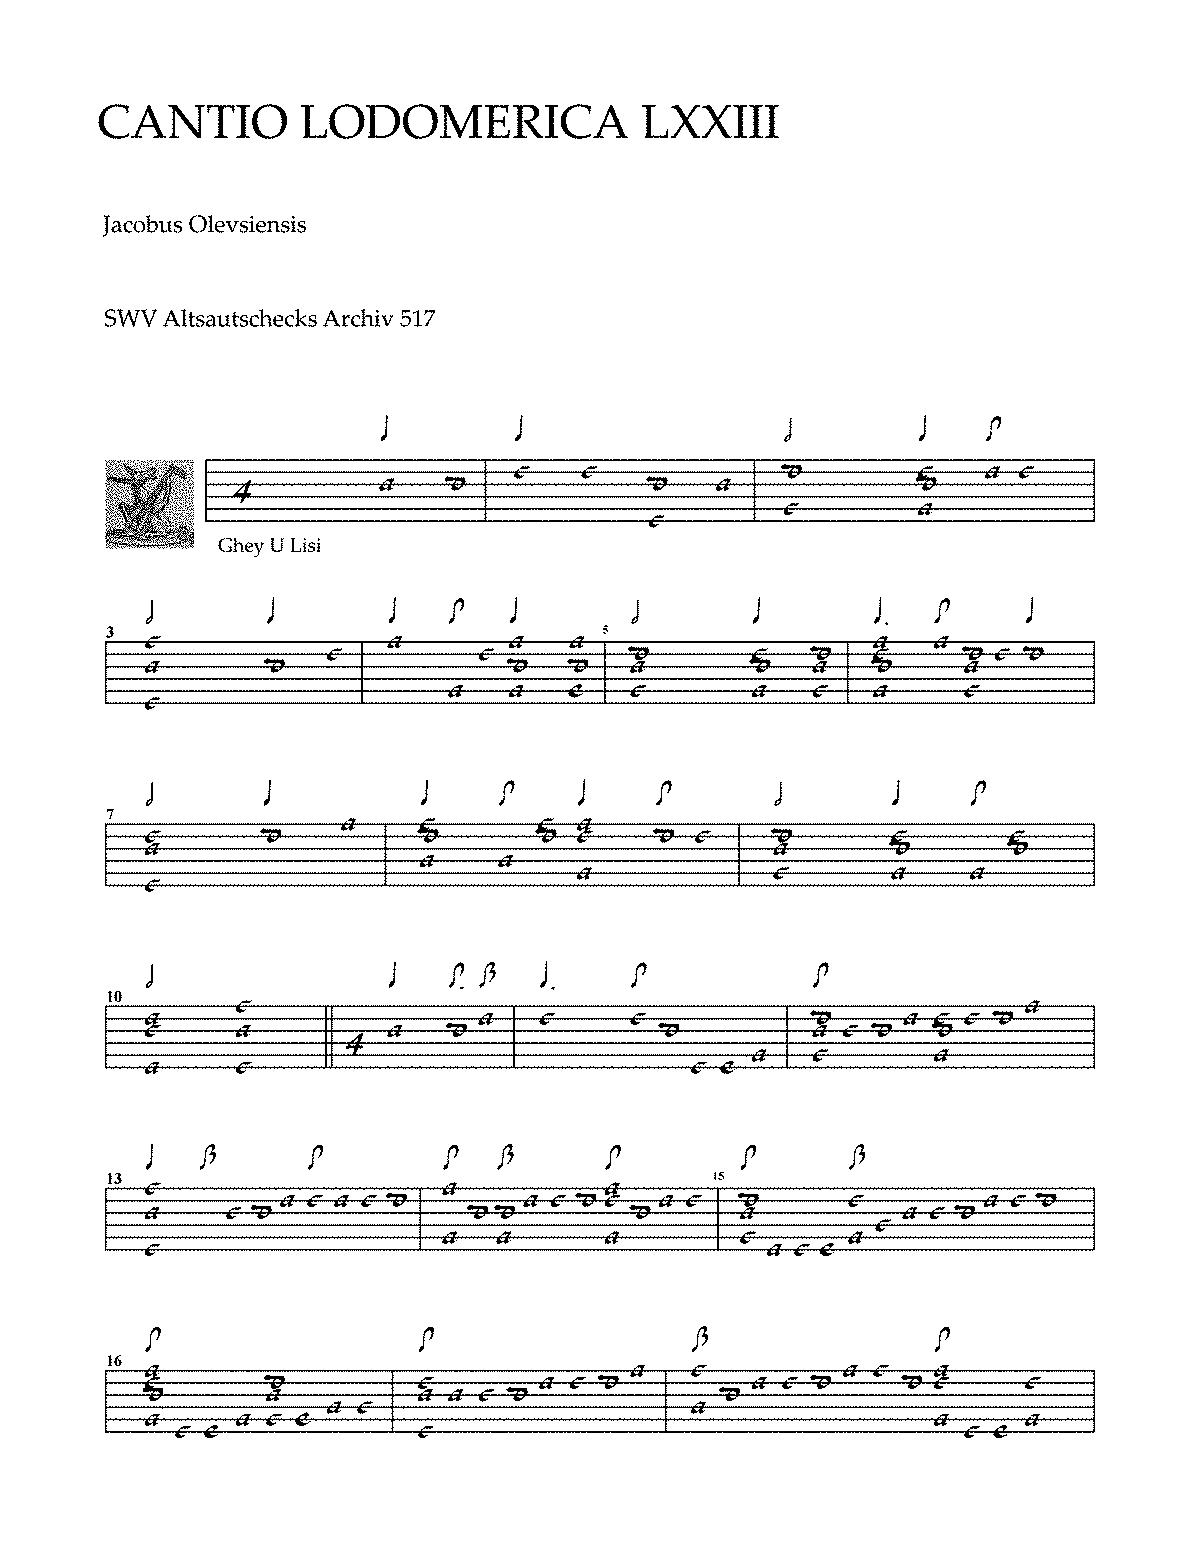 Cantio Lodomerica LXXIII (Turovsky-Savchuk, Roman) - IMSLP